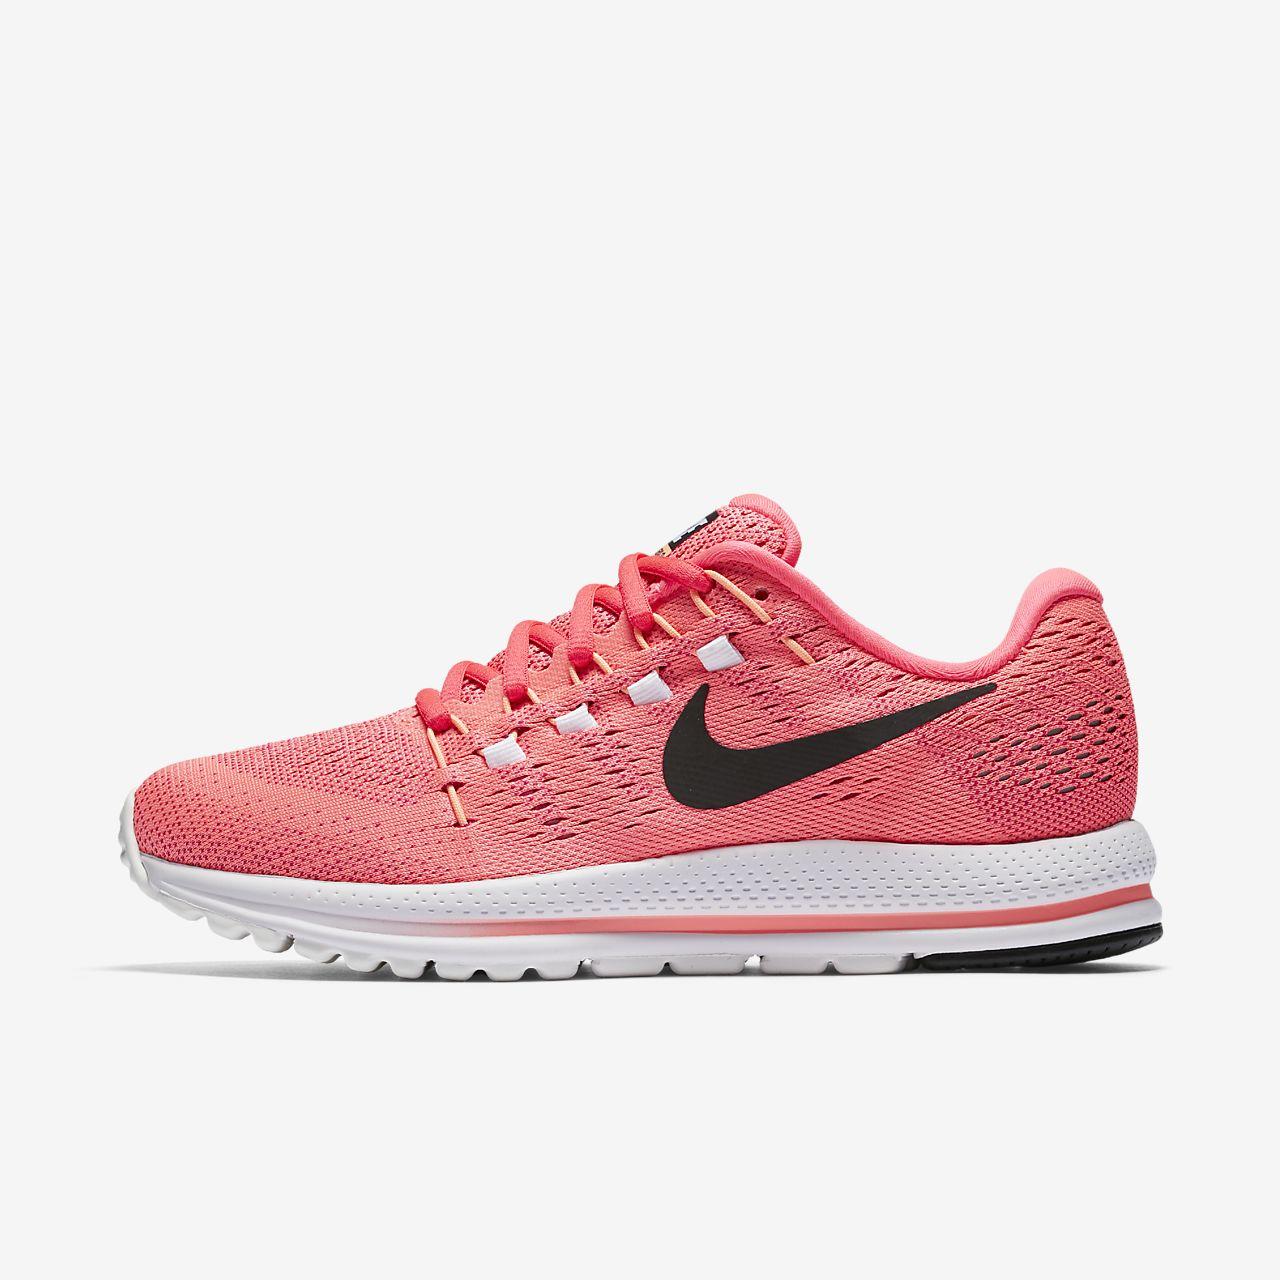 ... Chaussure de running Nike Air Zoom Vomero 12 pour Femme